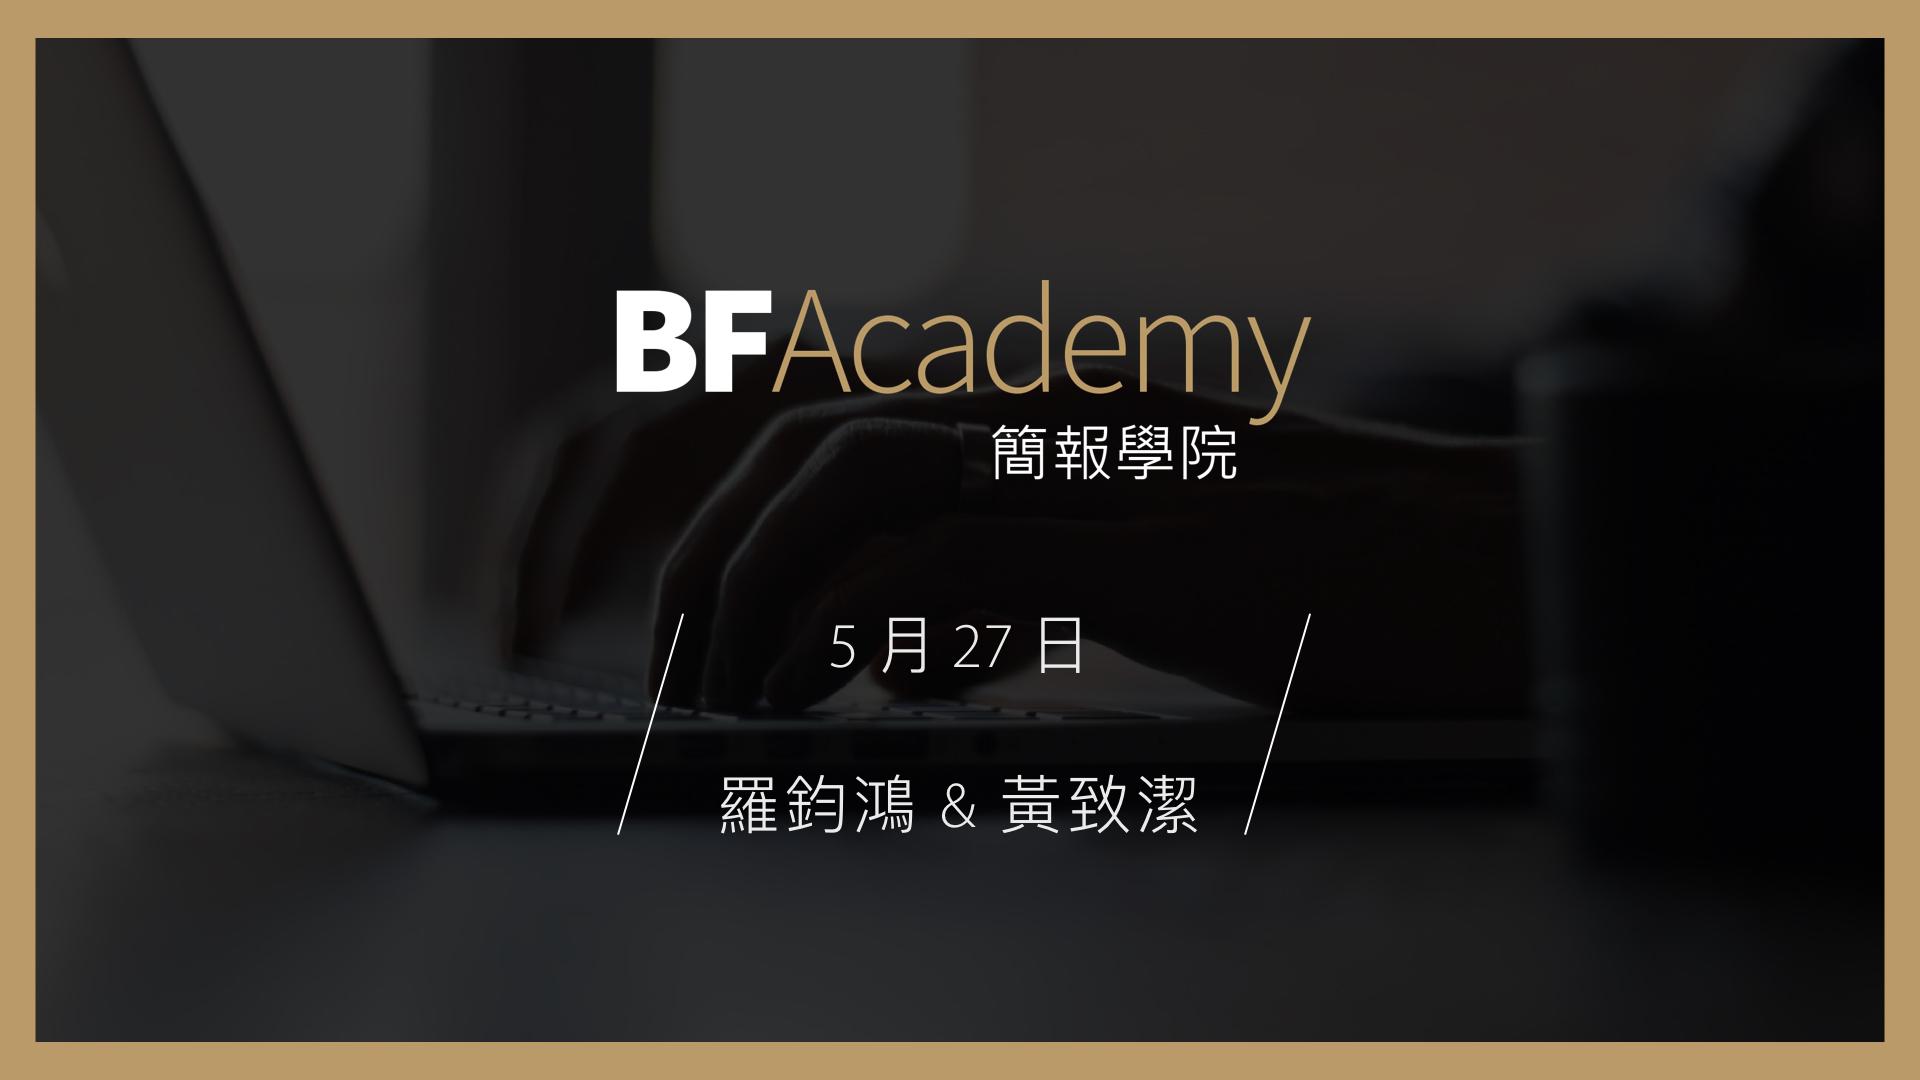 BFAcademy #6 羅鈞鴻 .012.jpeg